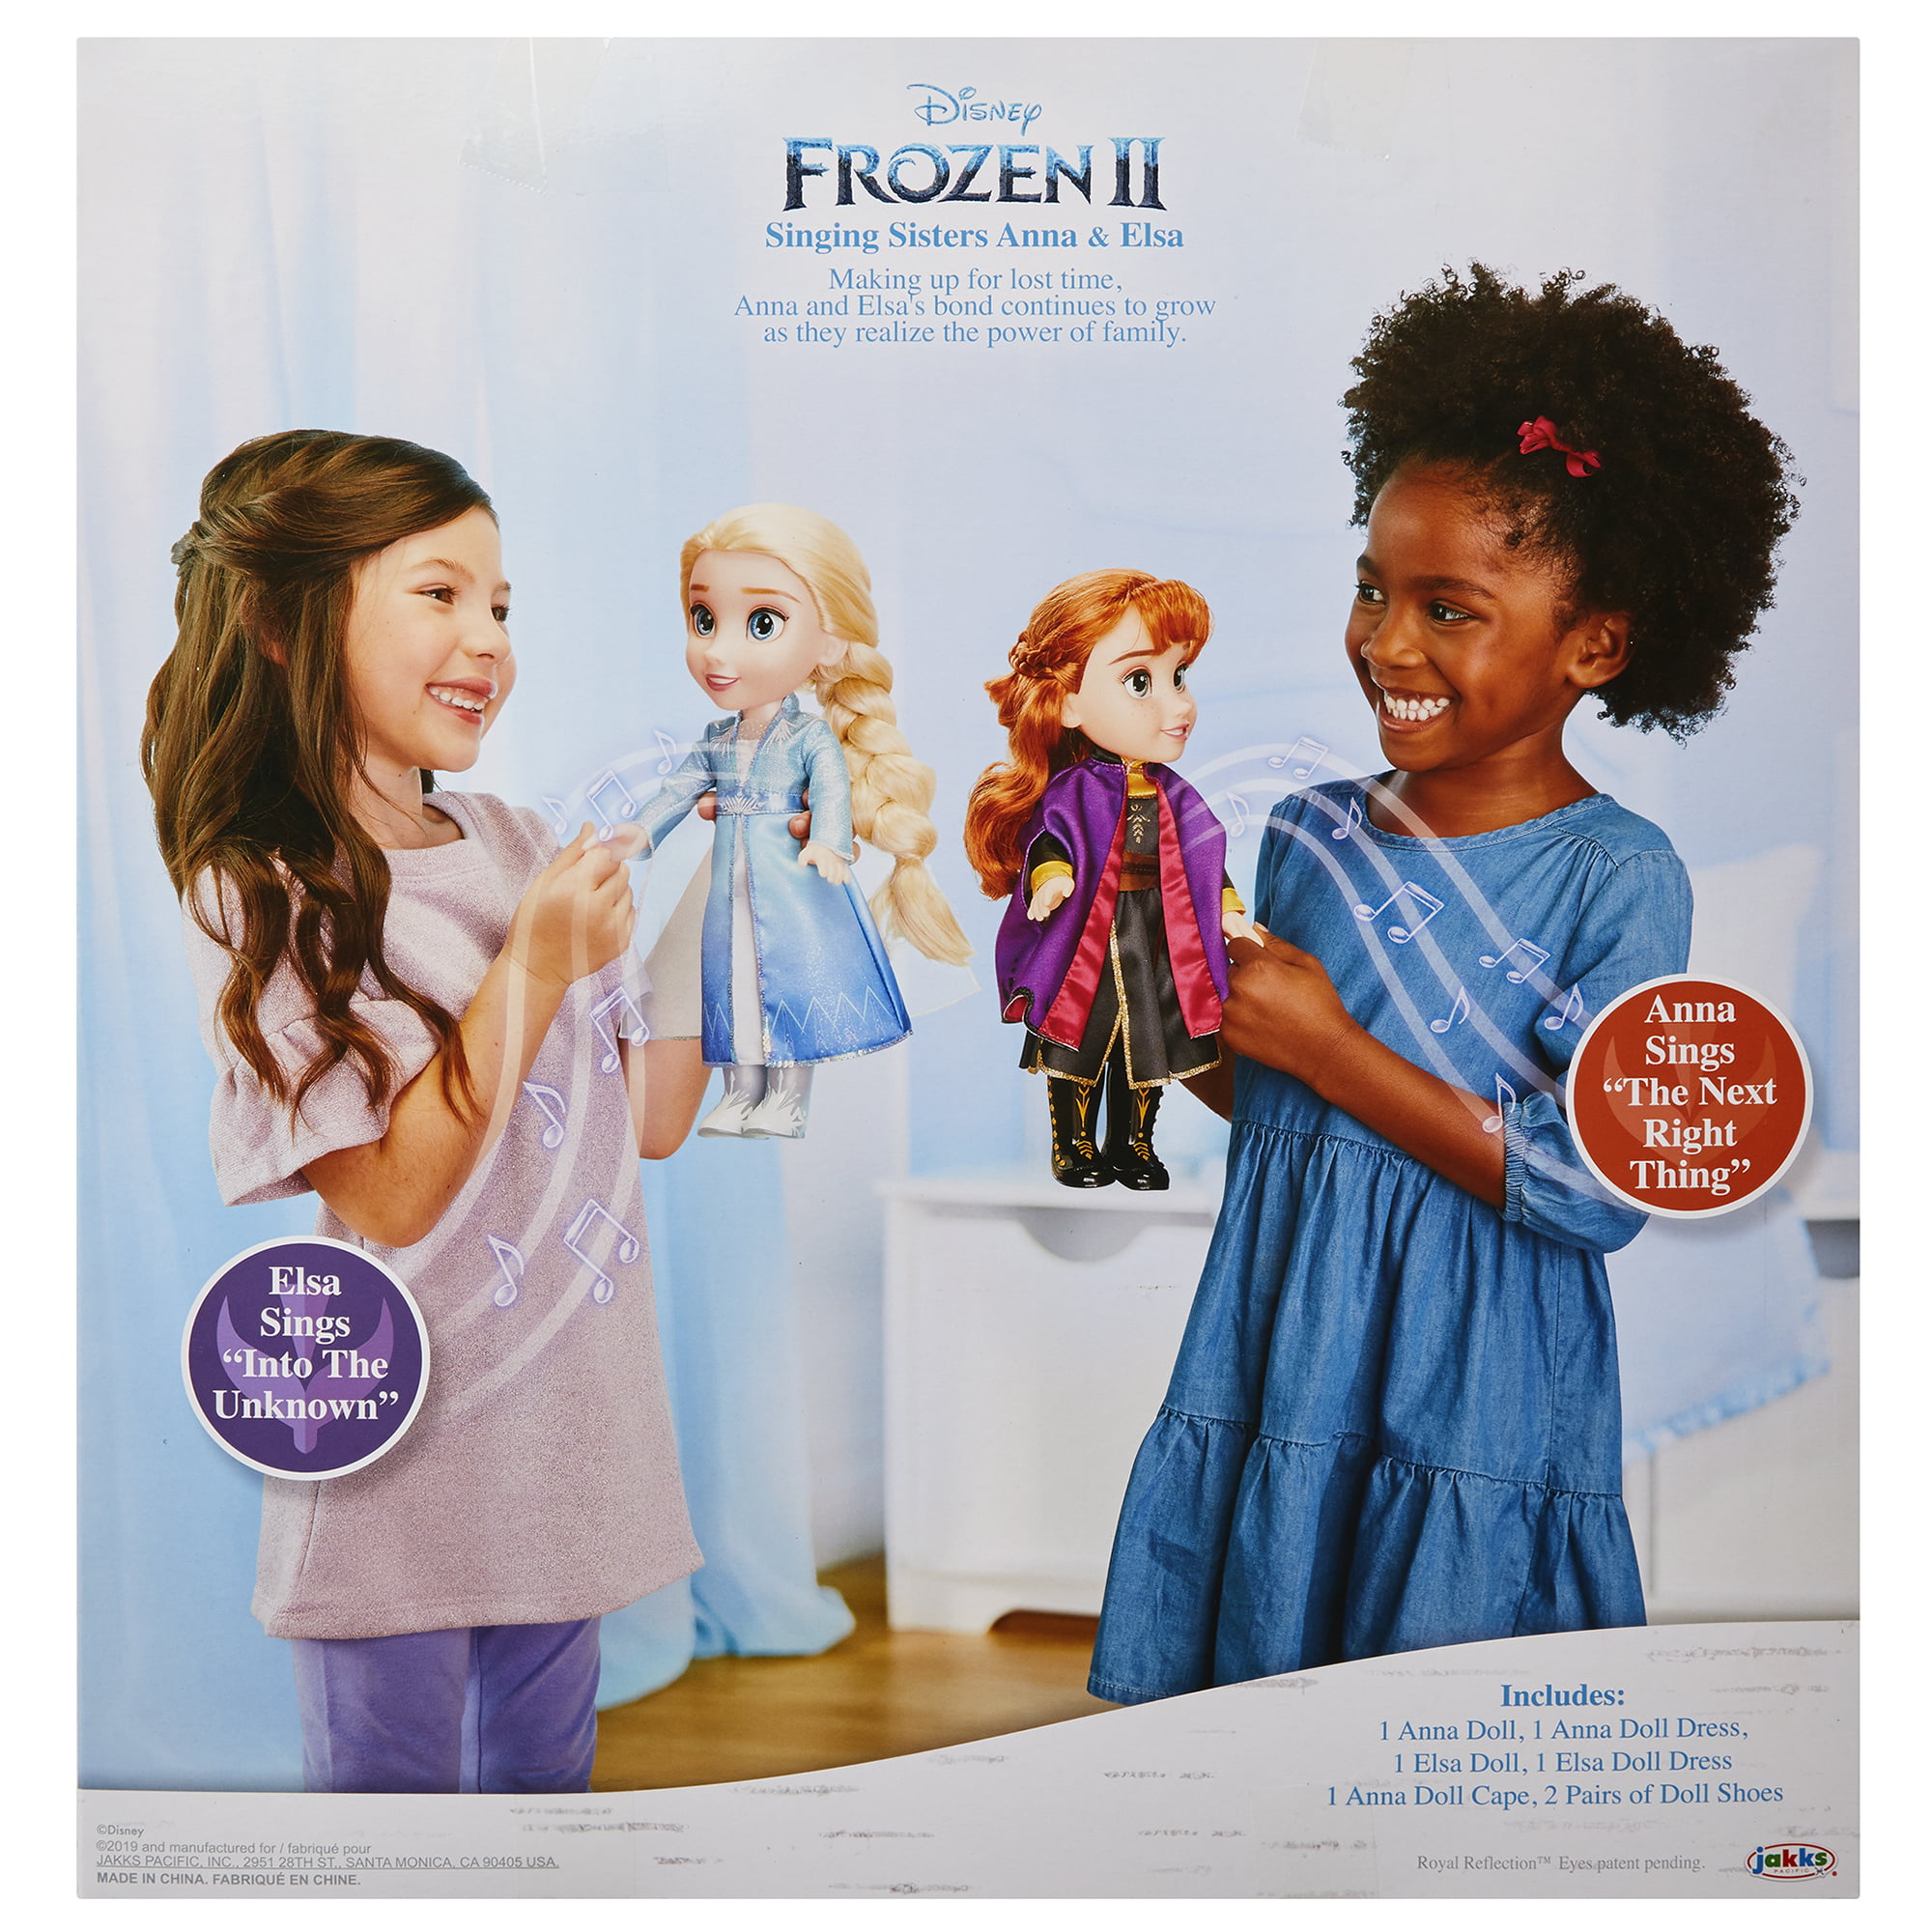 Disney Frozen 2 Singing Sisters Anna Elsa Interactive Walmart Exclusive Doll Set